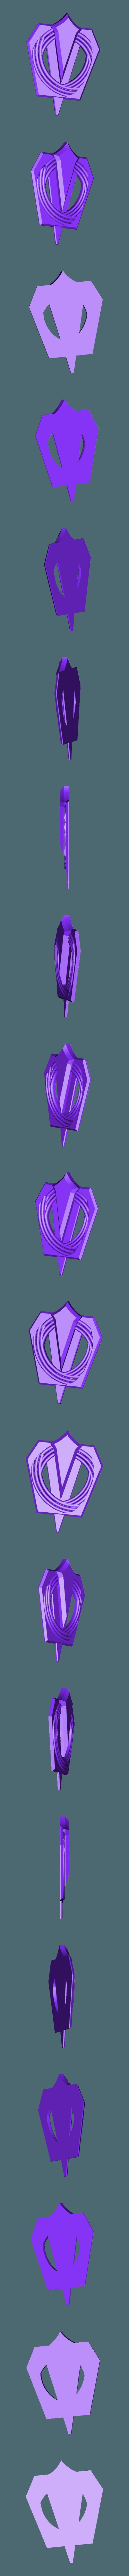 50_kils.stl Download free STL file Mirror Universe Medal (Star Trek Discovery) • 3D printer object, poblocki1982